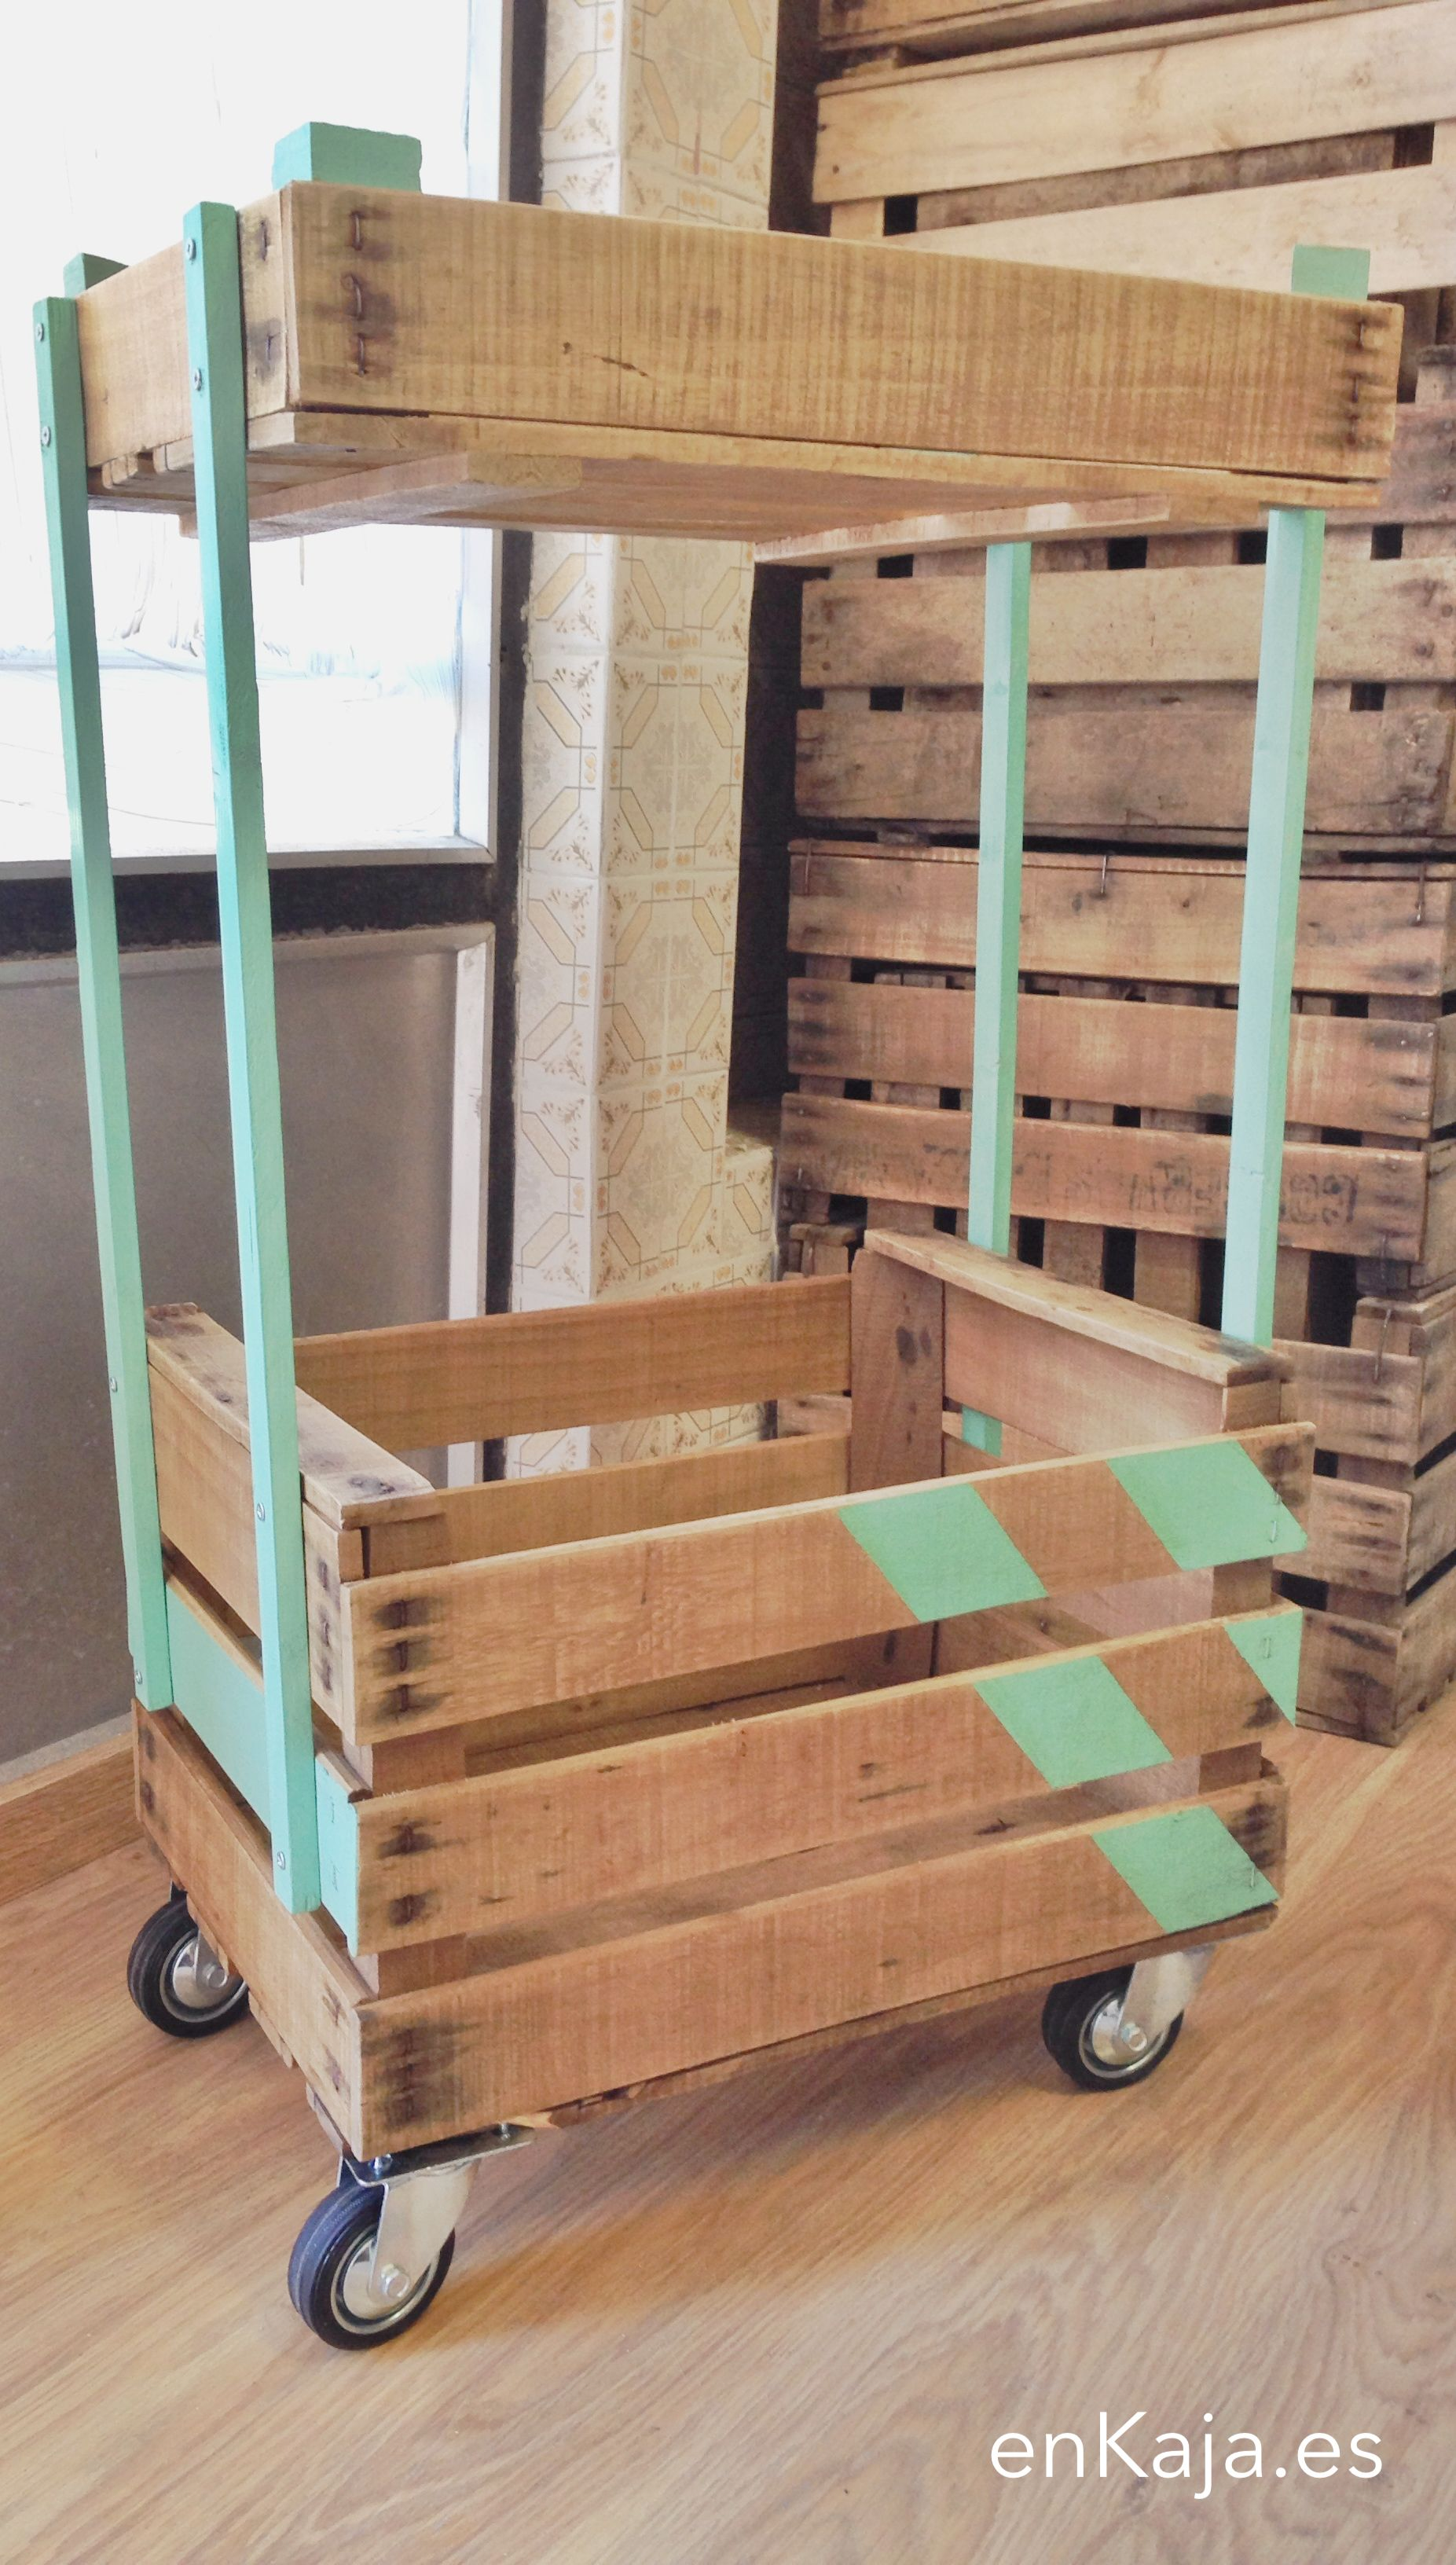 Wooden crate caja de madera cajas de madera ideas deco - Cajas de madera manualidades ...